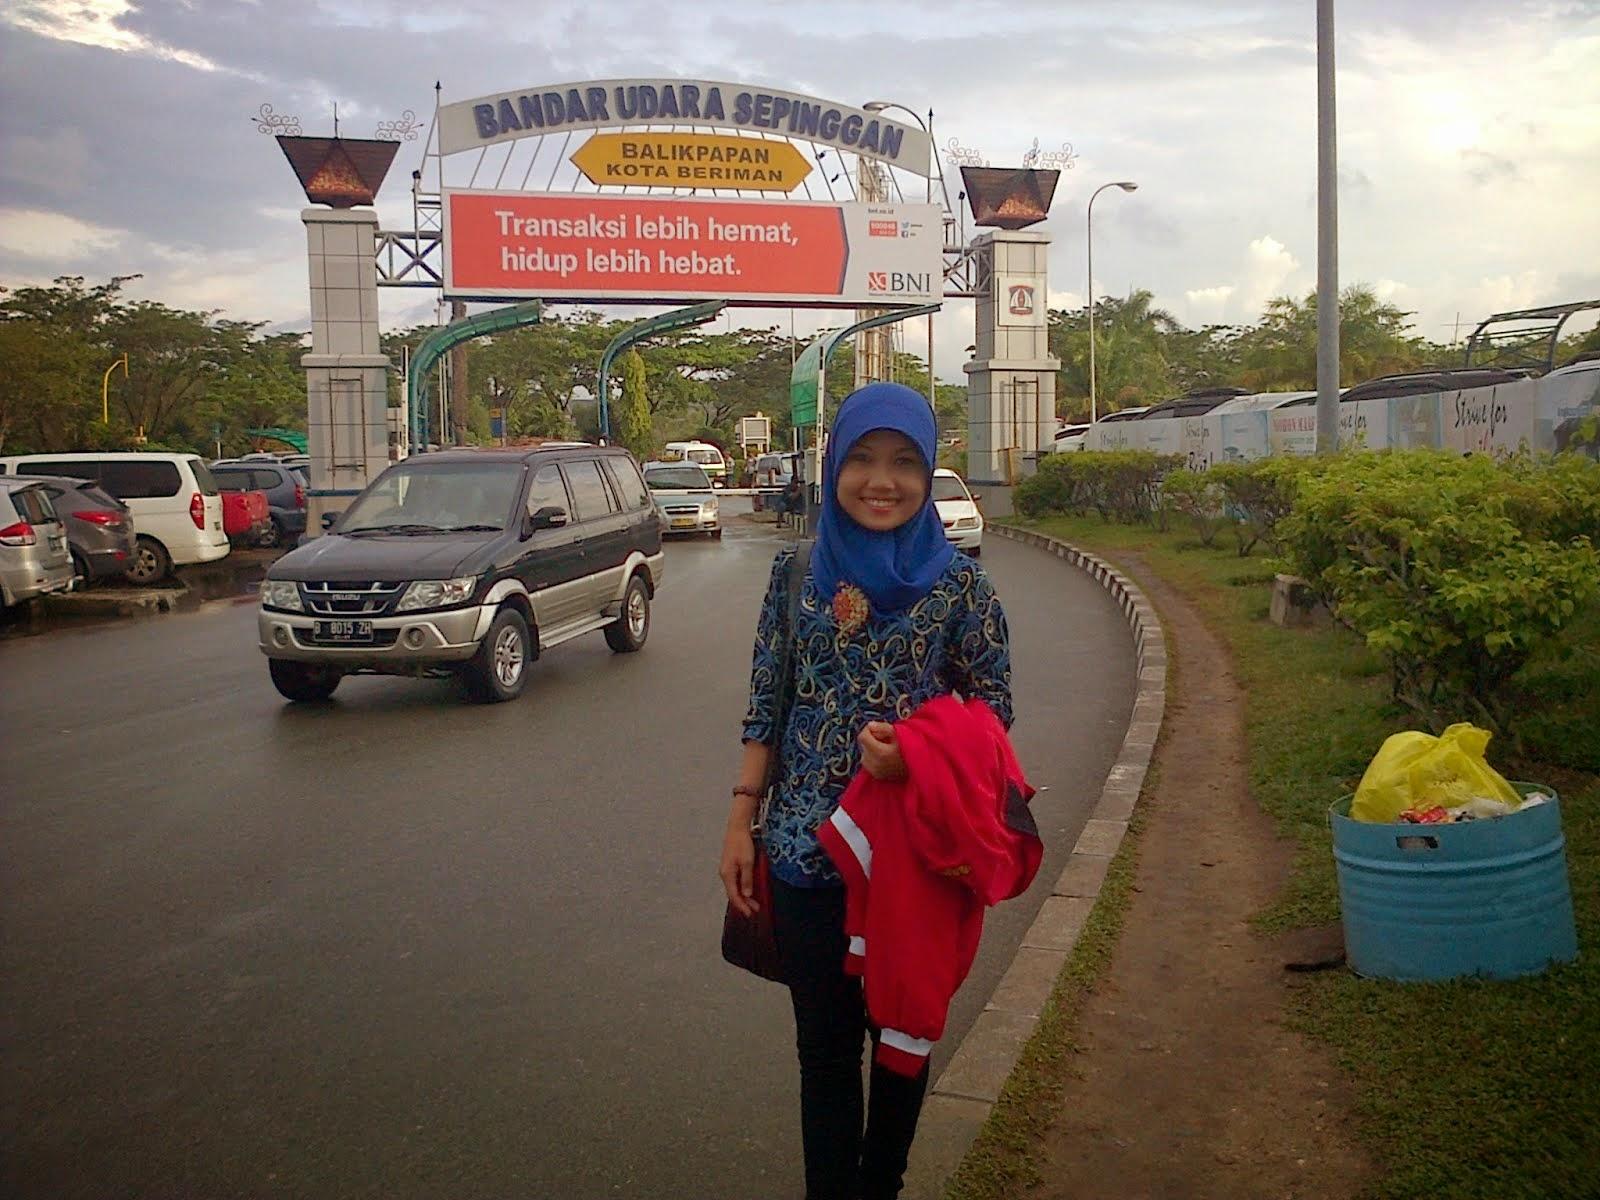 Kalimantan Timur 2013